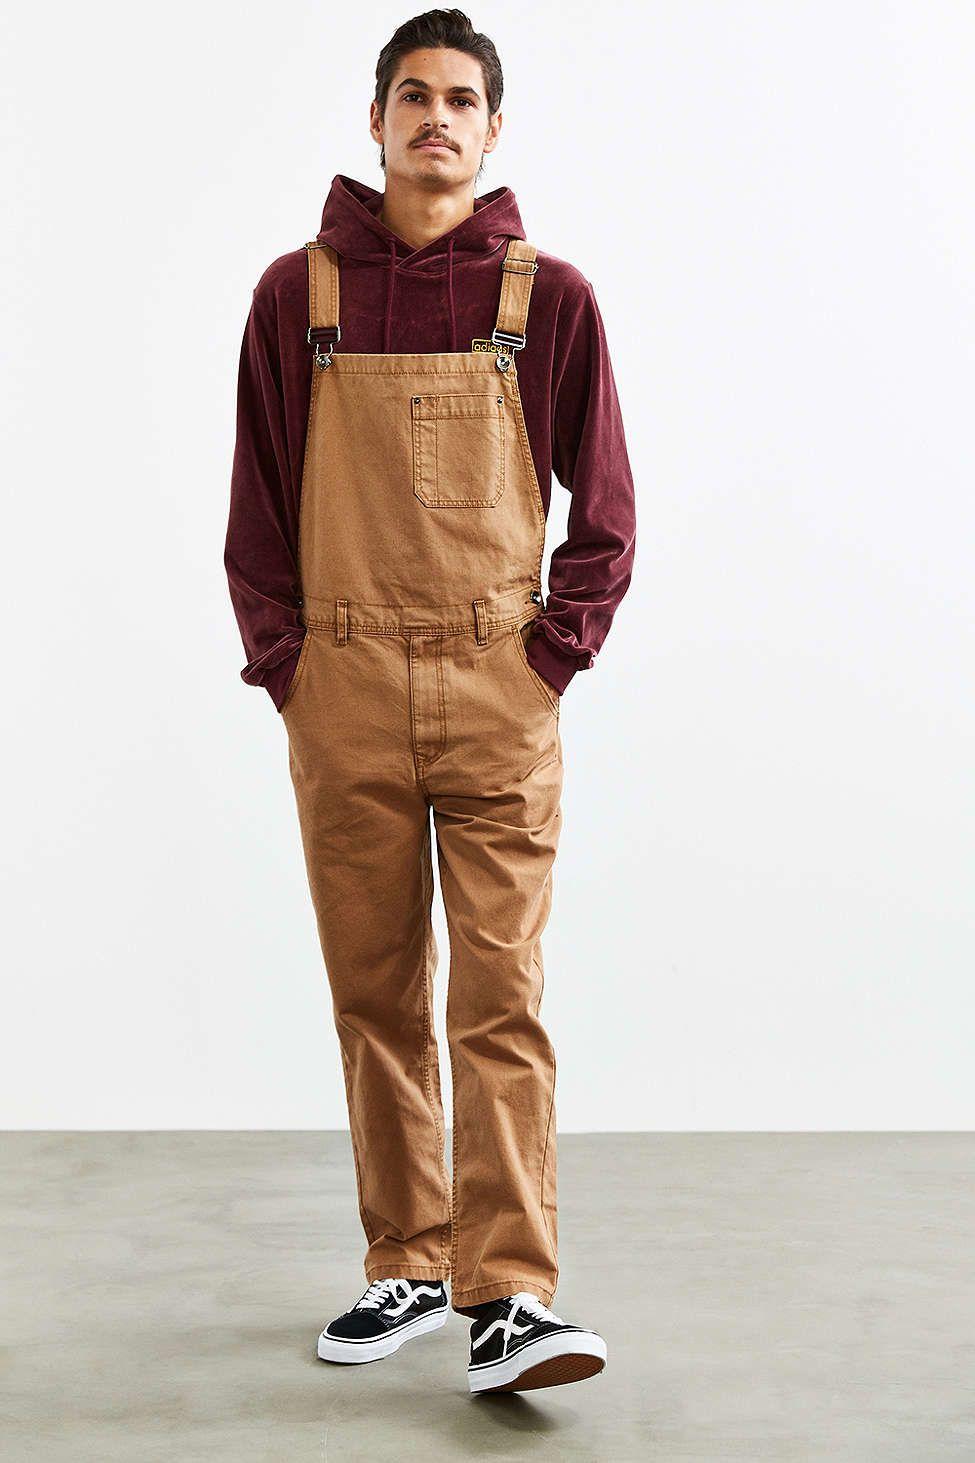 BDG Dense Cotton Canvas Overall | Cotton Canvas Menu0026#39;s Fashion And Men Wear